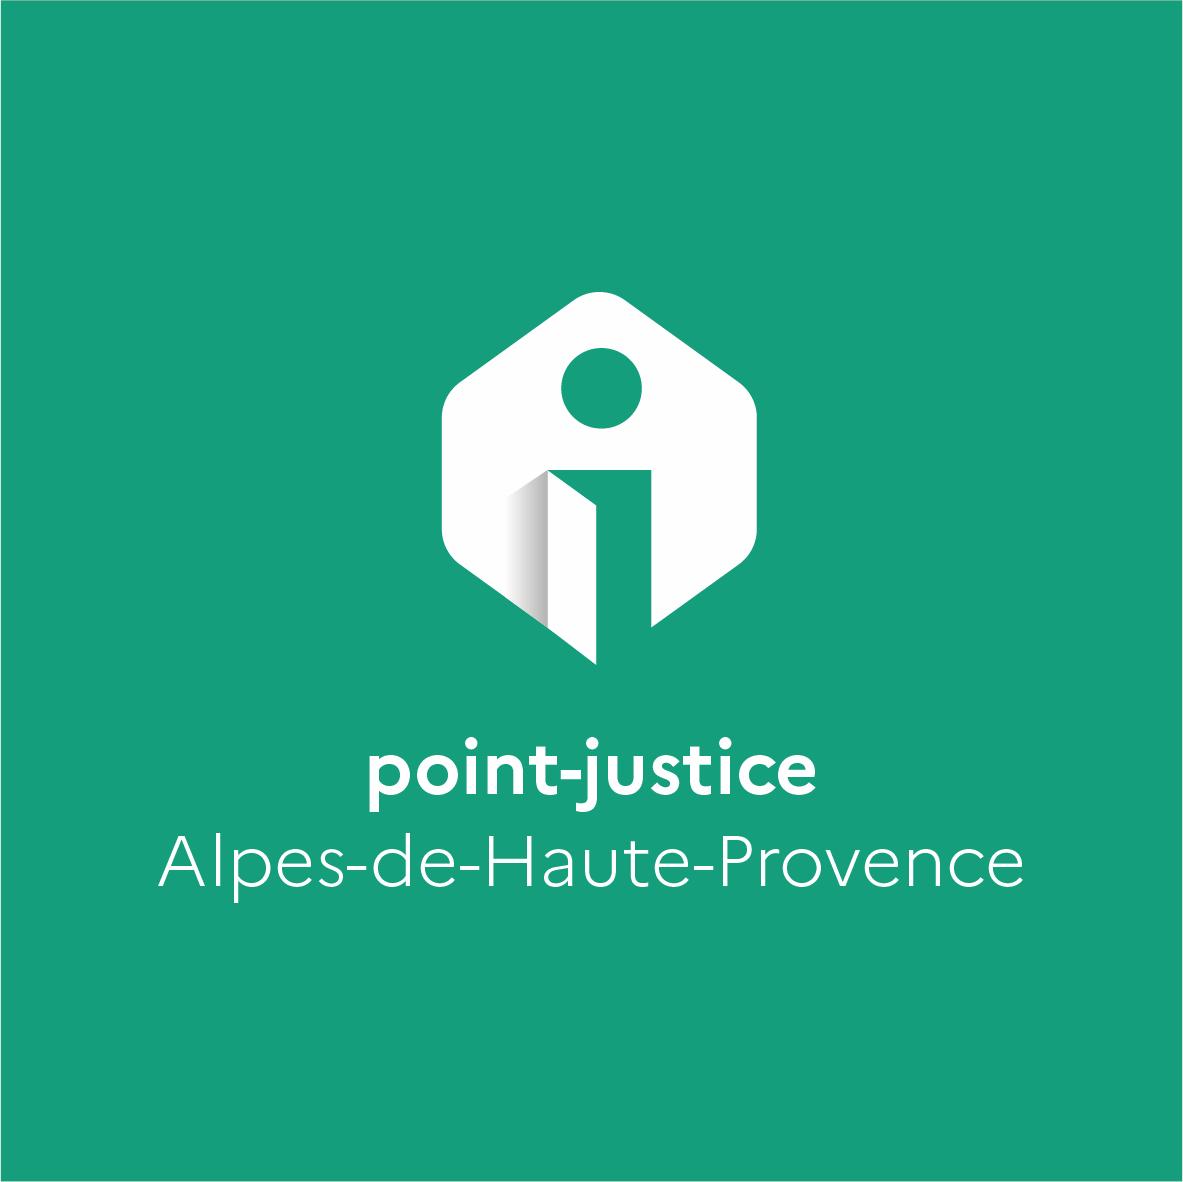 04_Alpes-de-Haute-Provence_logo